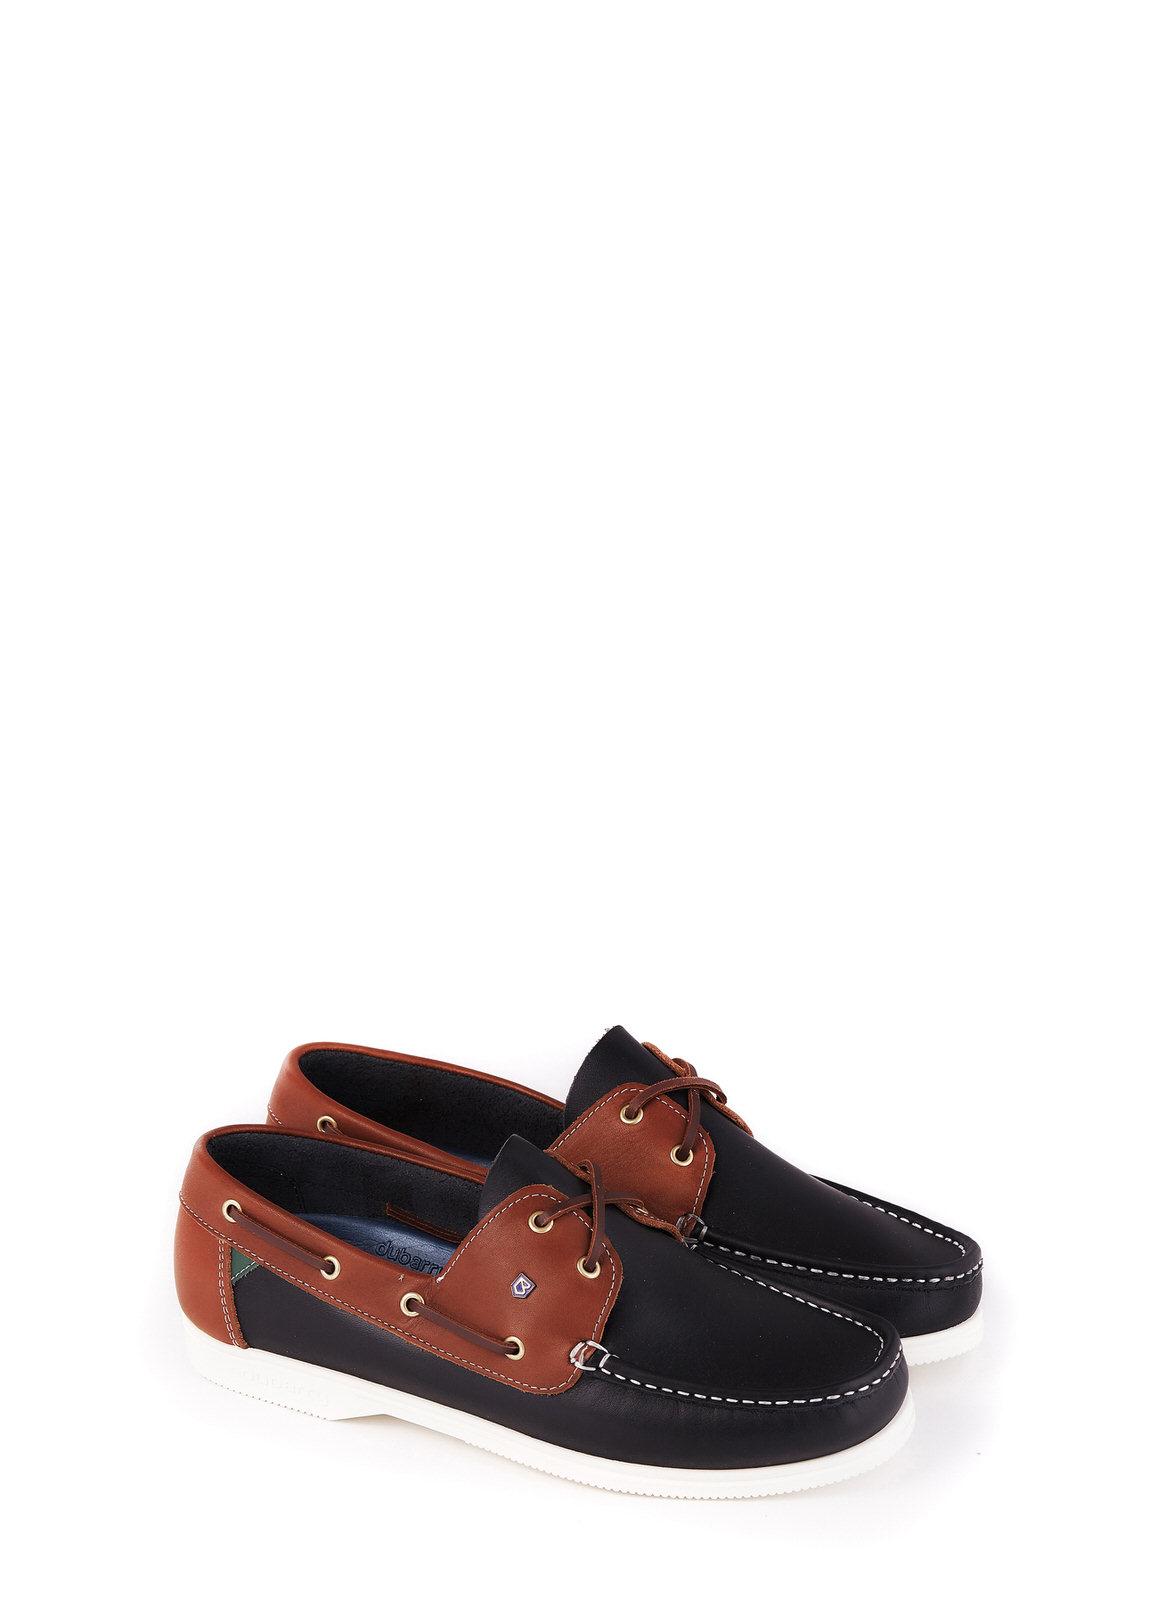 Admirals Deck Shoe - Navy/Brown